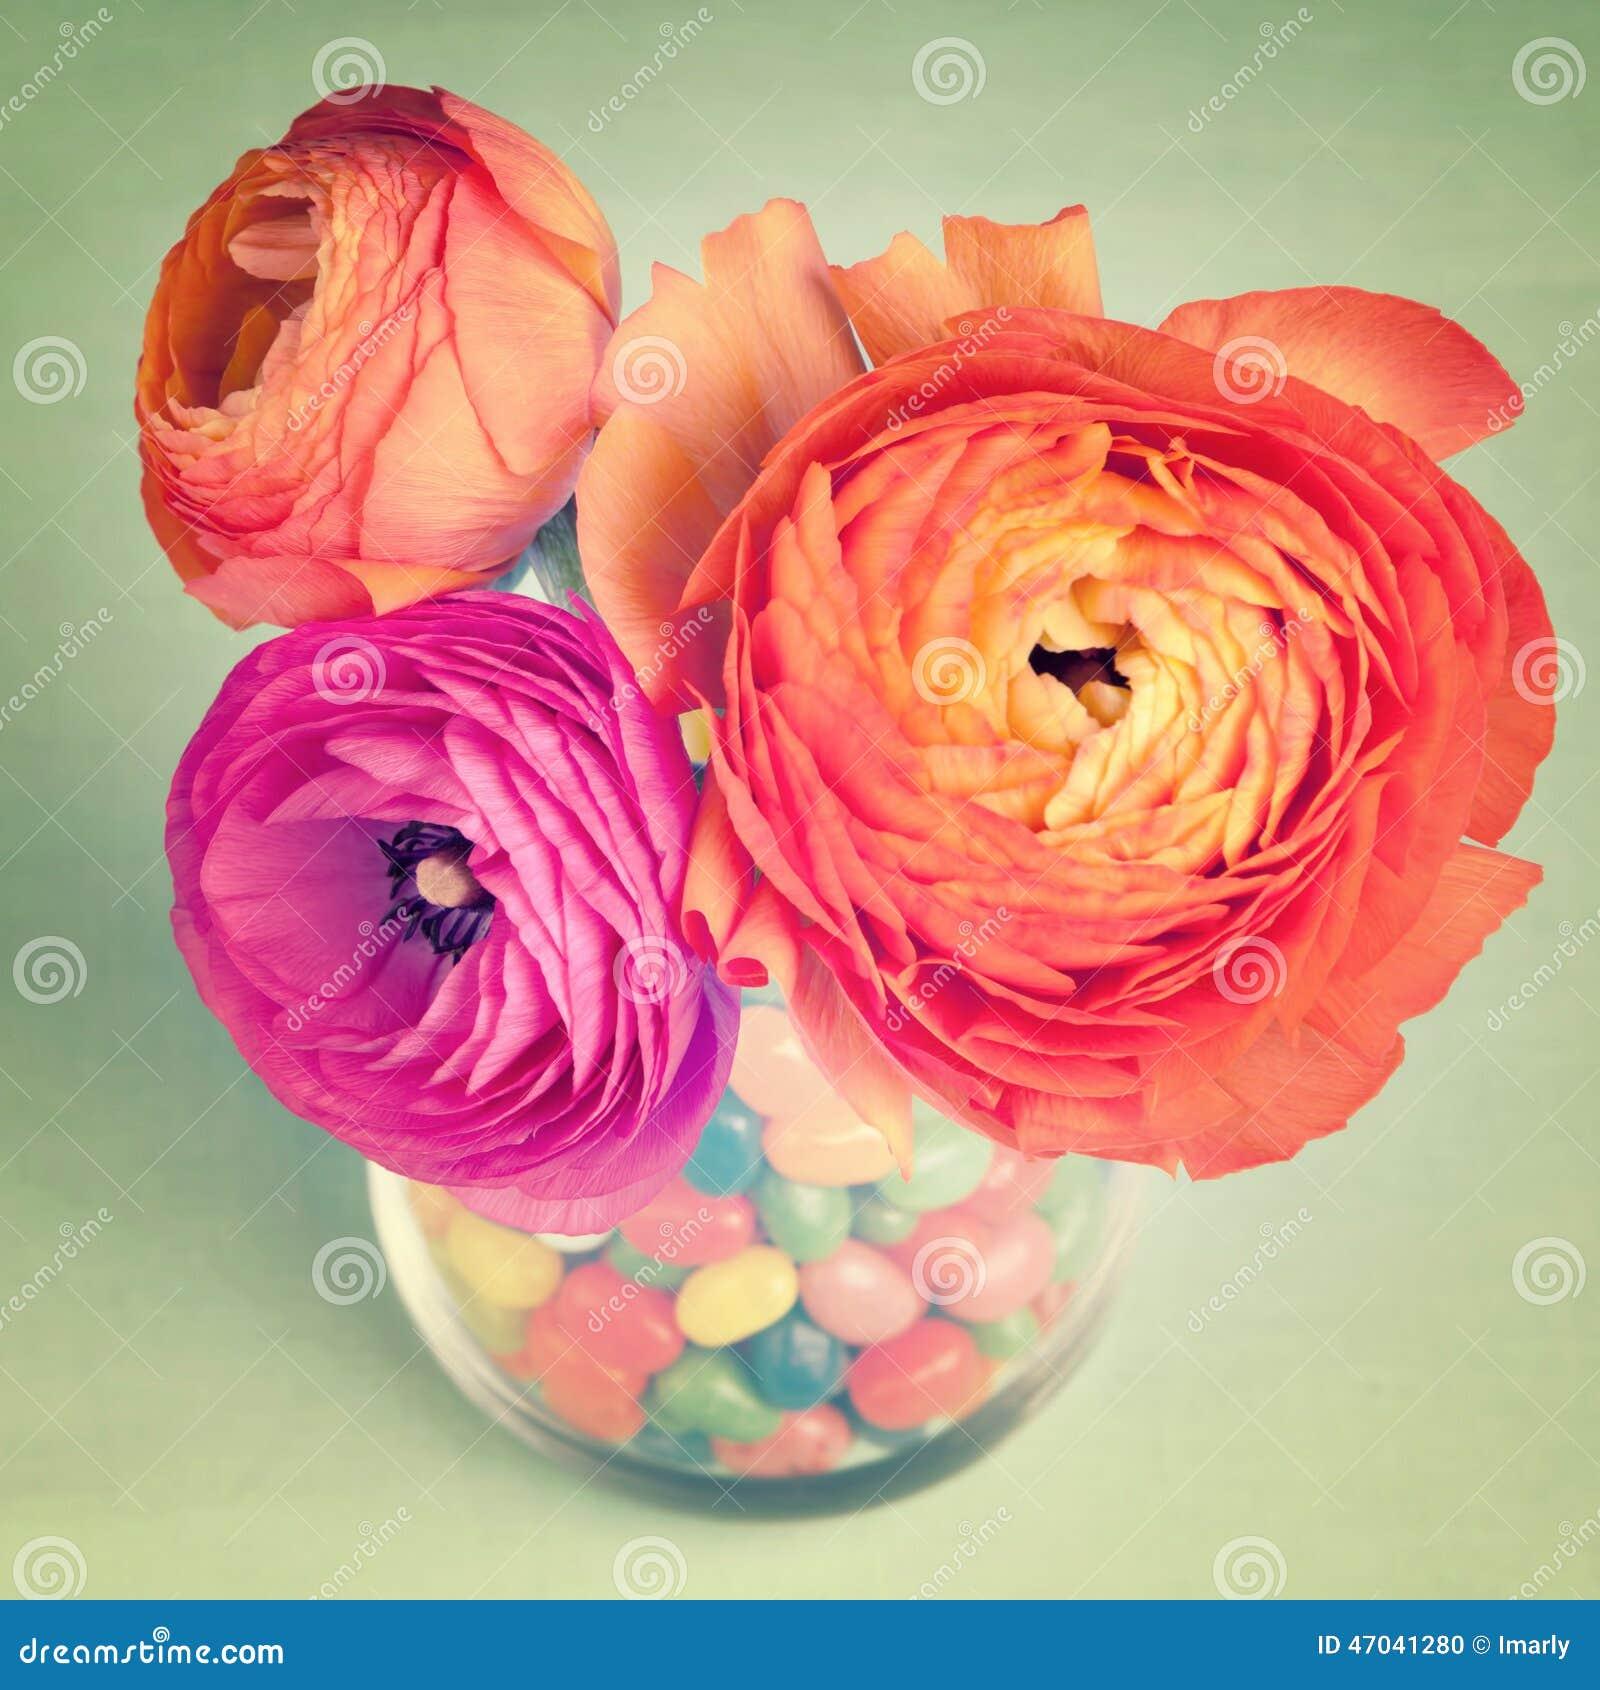 Pink and orange colorful ranunculus in a vase